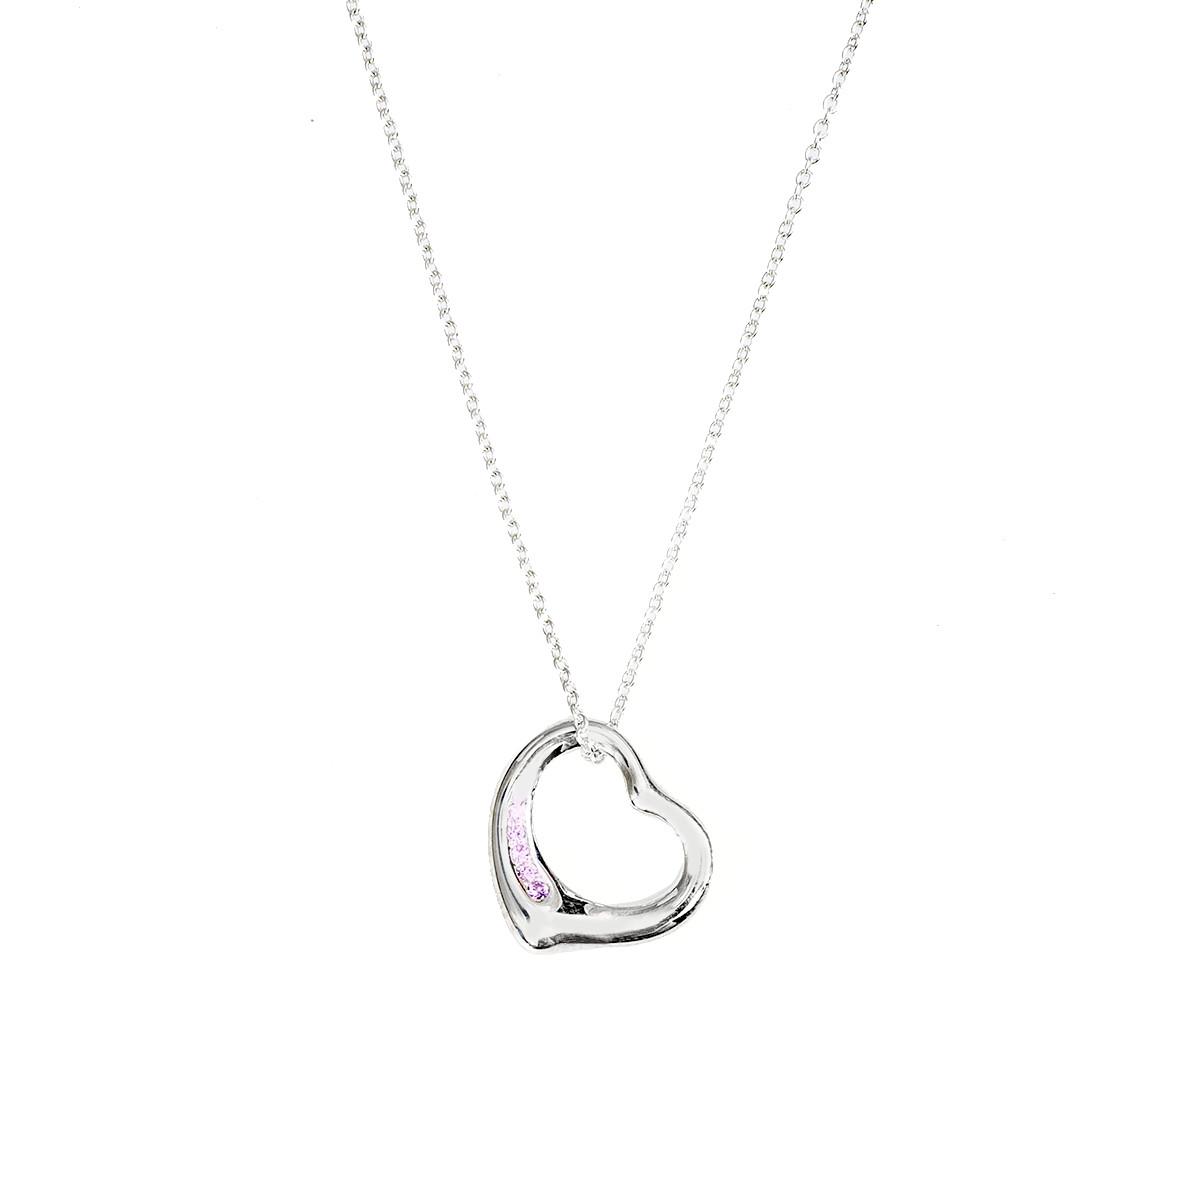 e5e316a074b90 Vintage Tiffany   Co. Elsa Peretti Pink Sapphire Open Heart Pendant